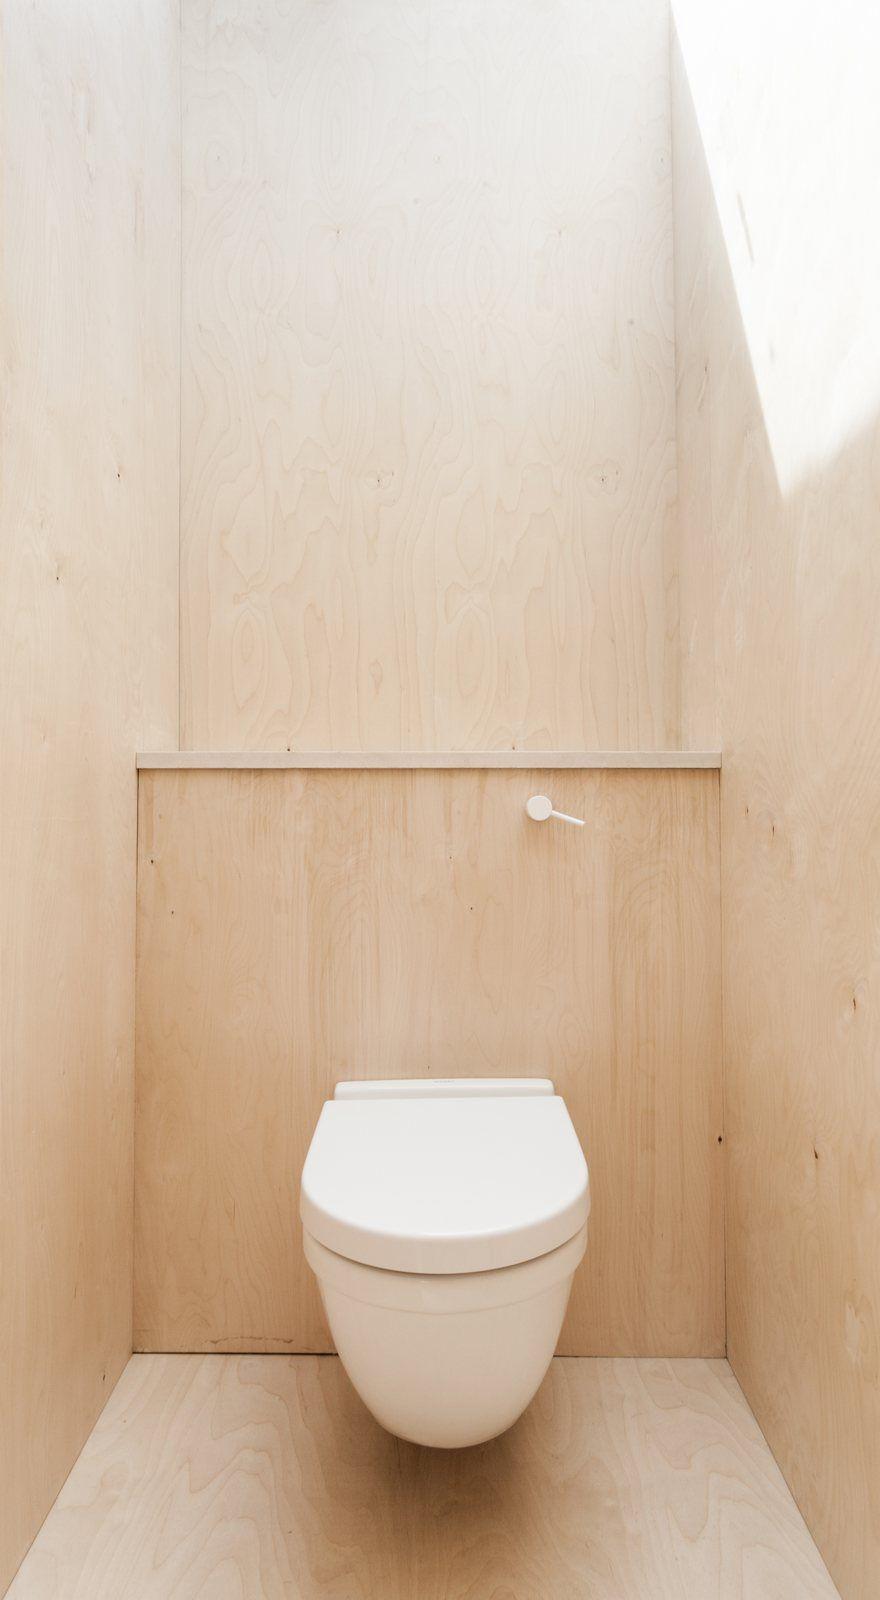 Deco Salle De Bain Simons ~ Plywood House By Simon Astridge Extension Bois Extension Et Sdb